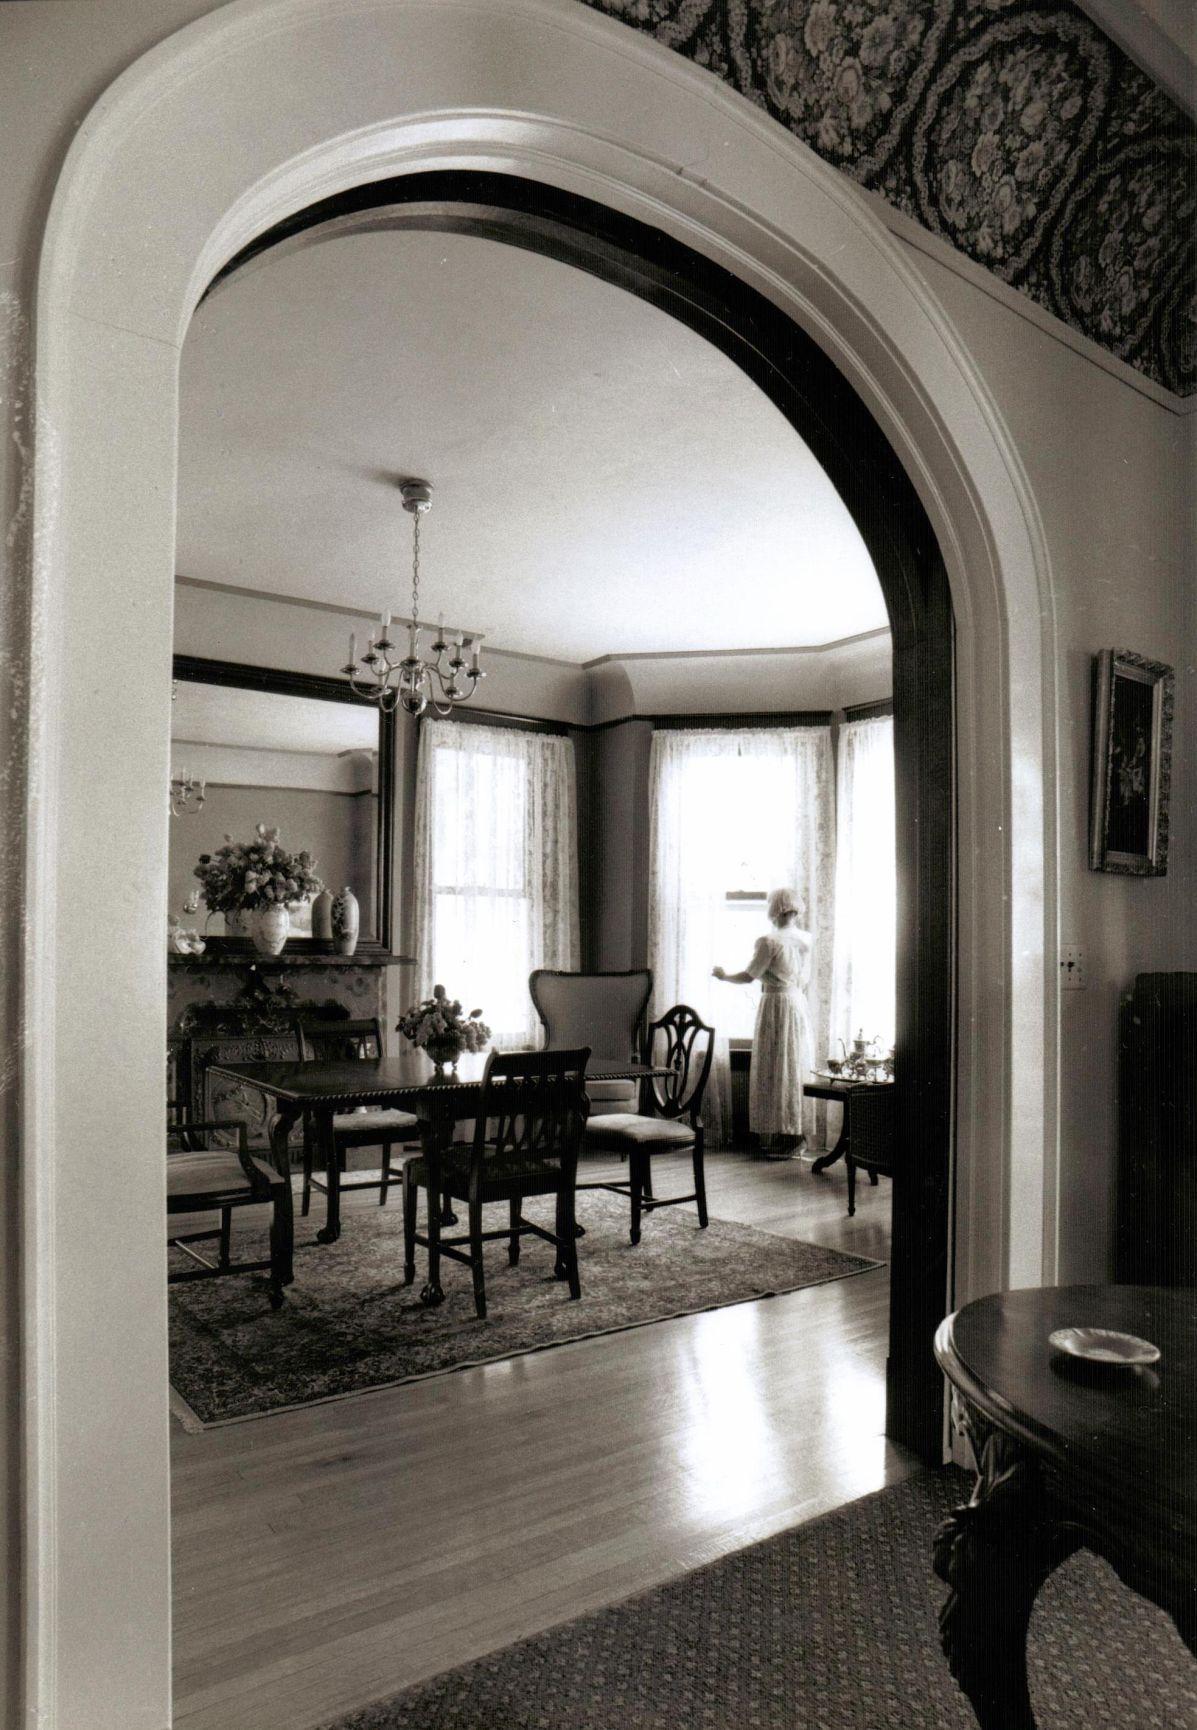 Photos: Iowa Historic Homes | Local News | qctimes.com on